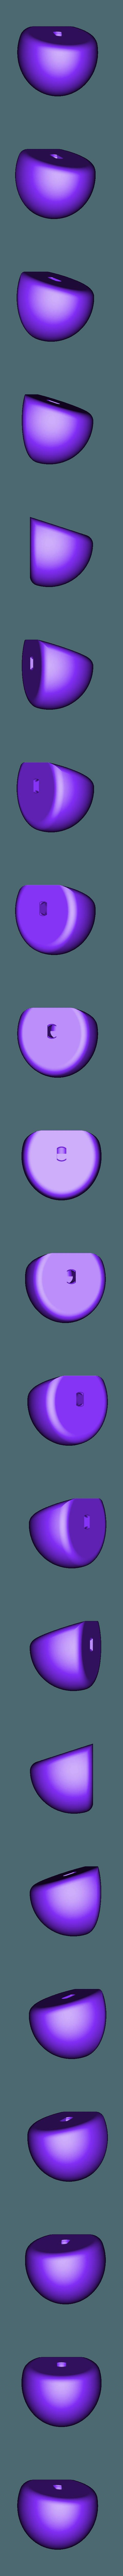 SulfurPh5b.stl Download free STL file Space-filling molecular models: Sulfur and Phosphorous expansion pack • 3D printer design, harfigger